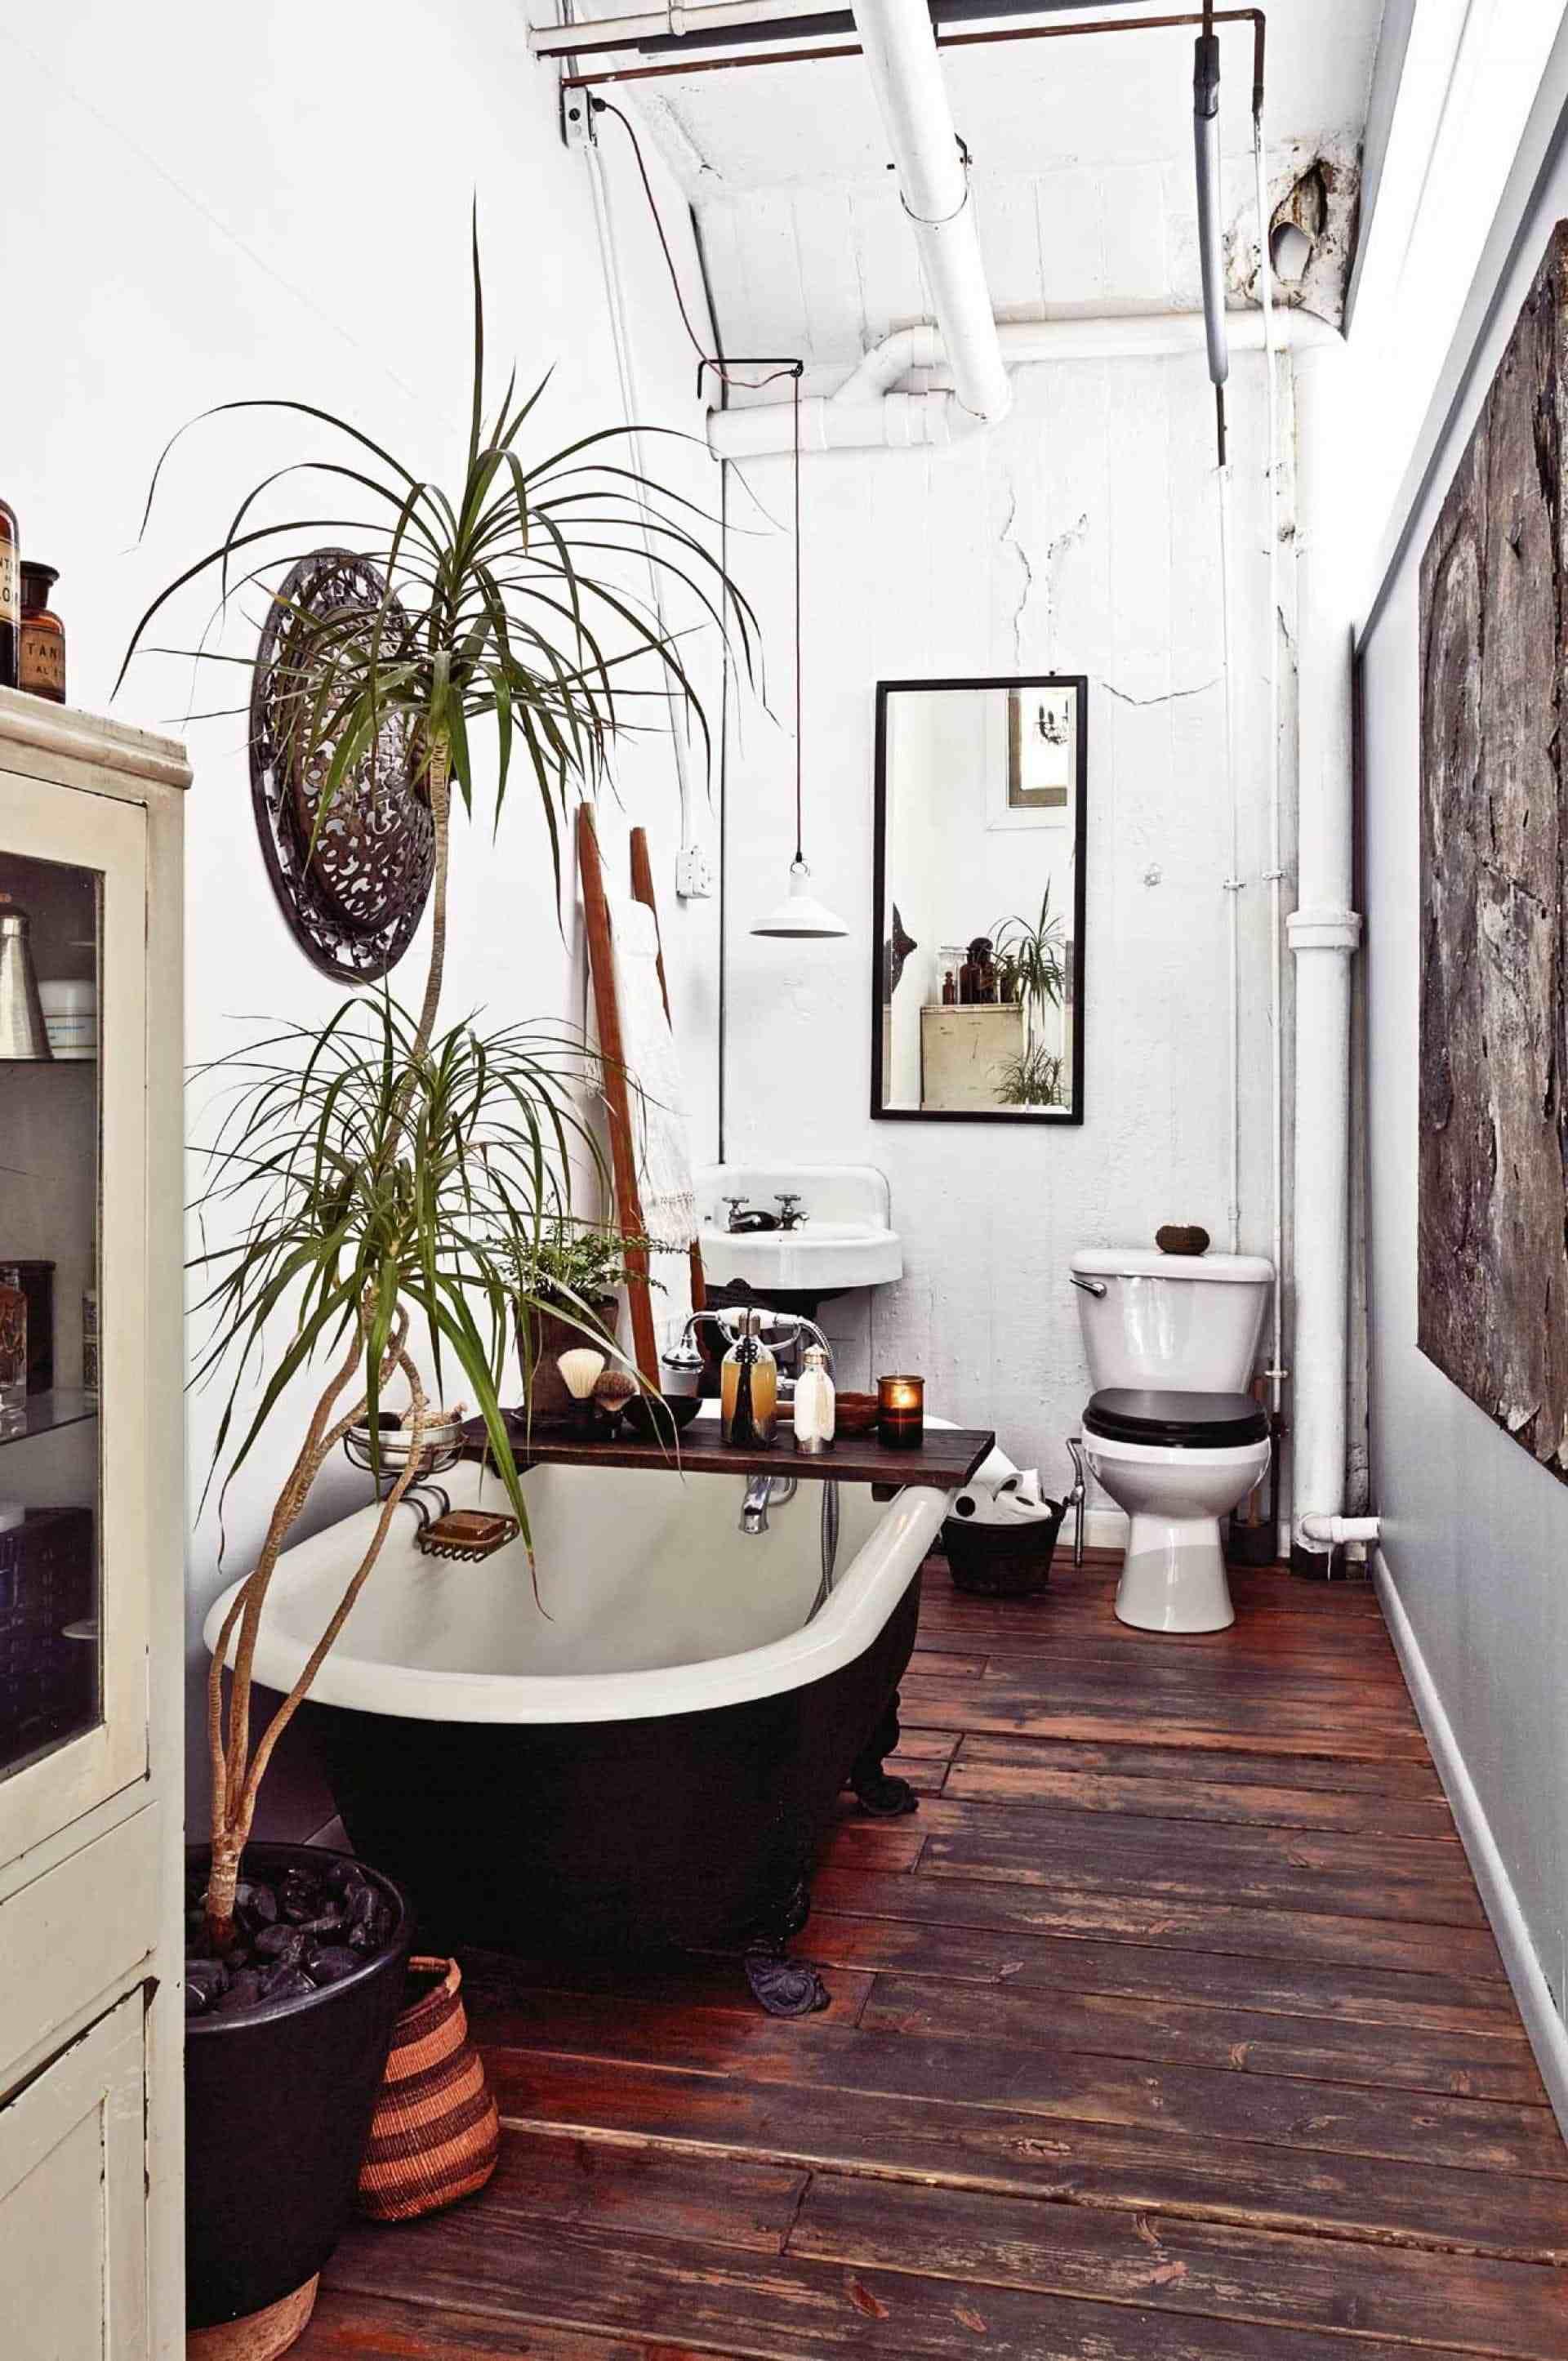 Classic boho bathroom